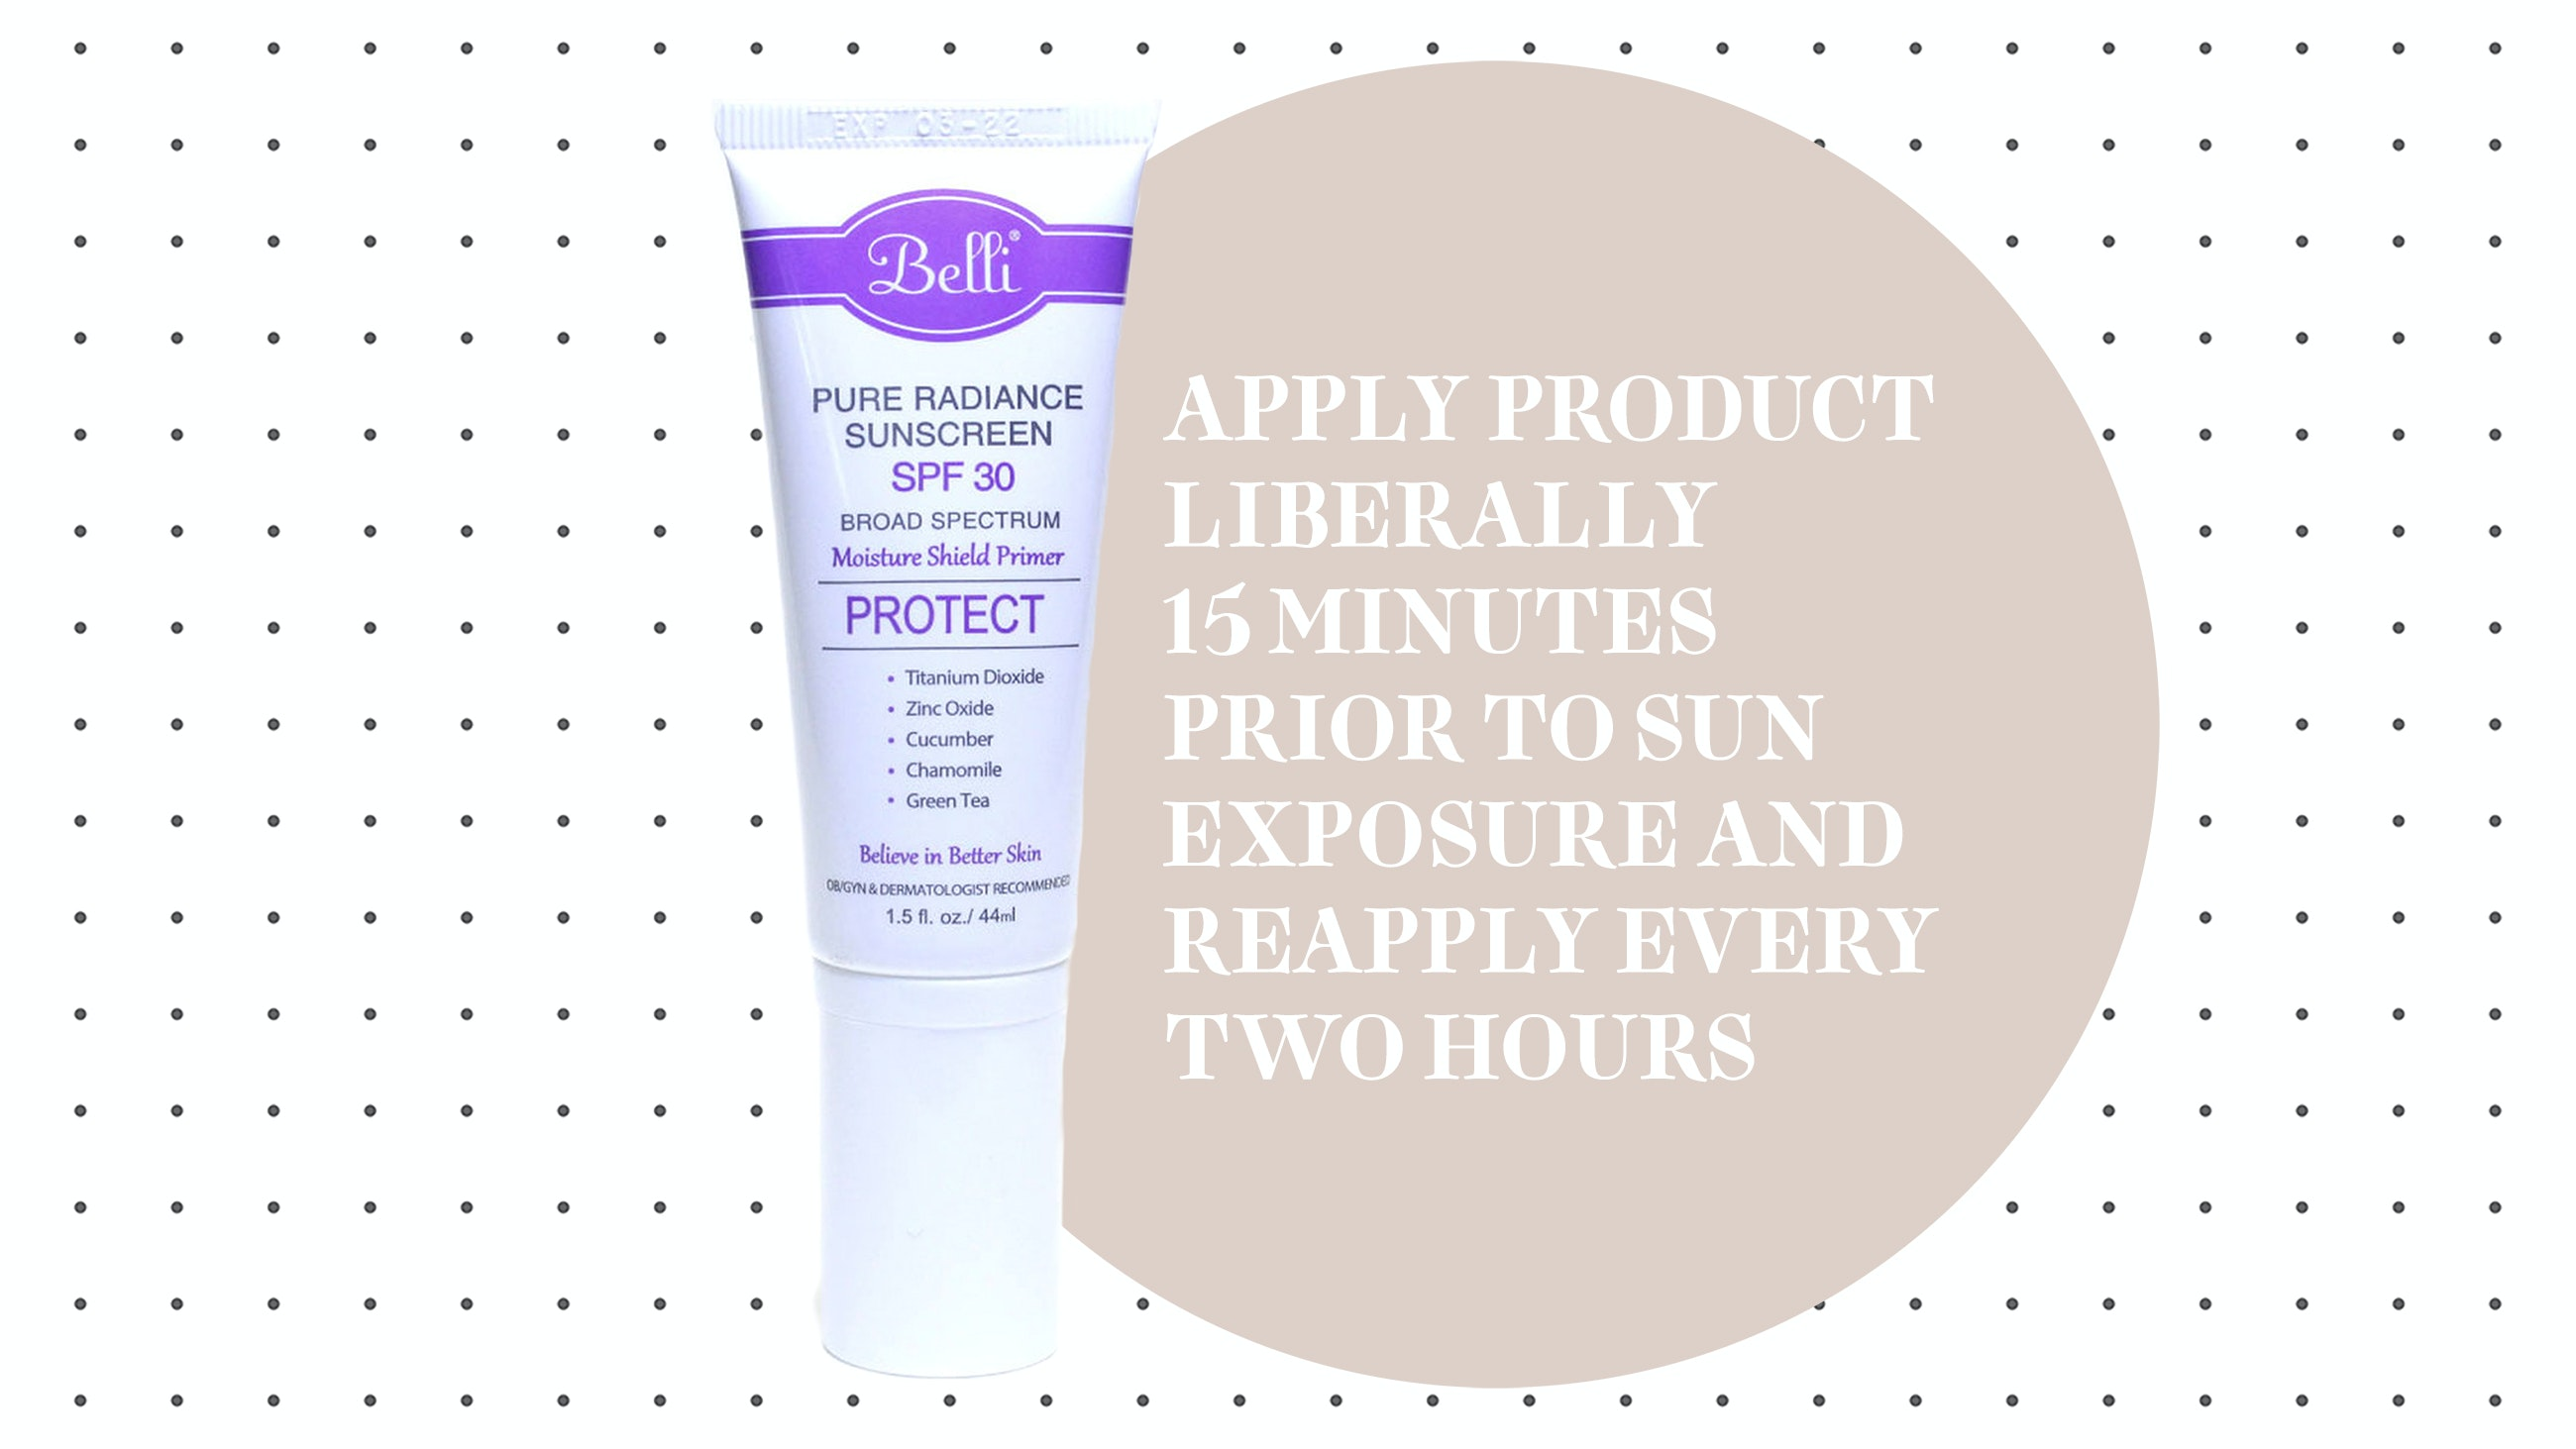 Belli Pure Radiance Sunscreen SPF 30